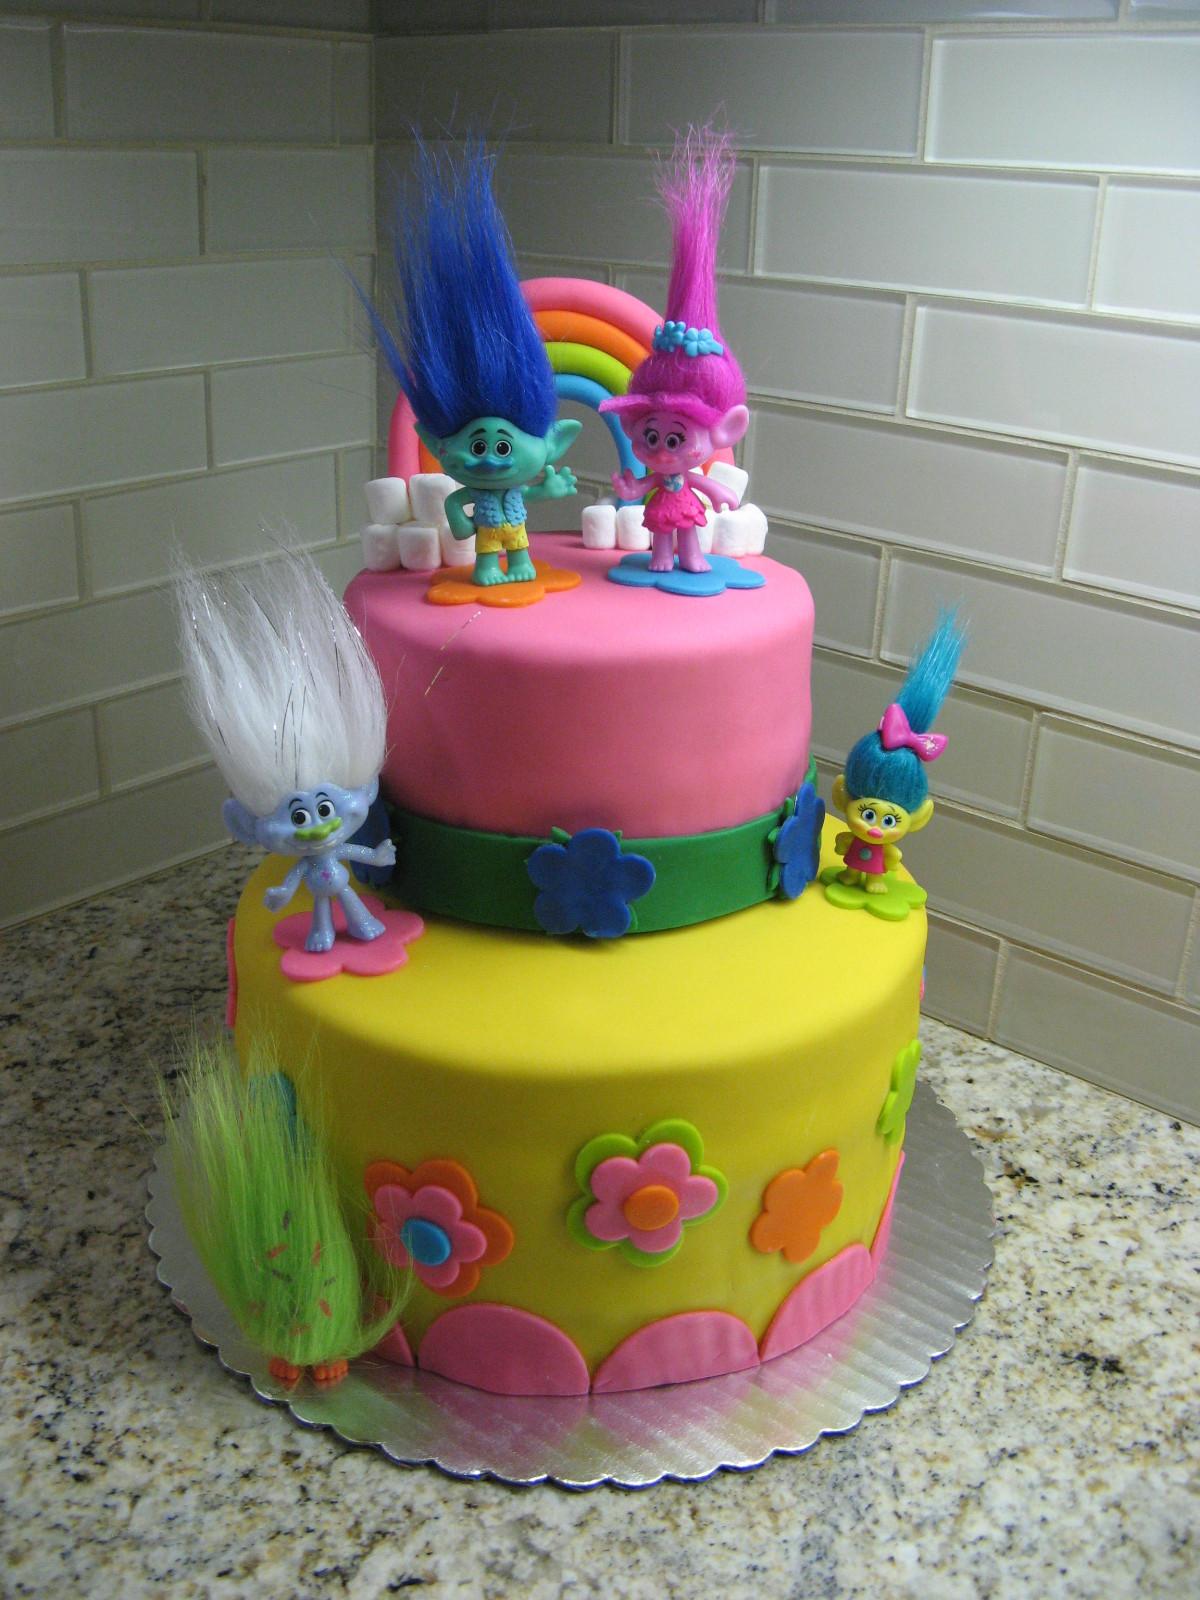 Troll Birthday Cake  Happy Blogiversary and a Trolls Inspired Cake